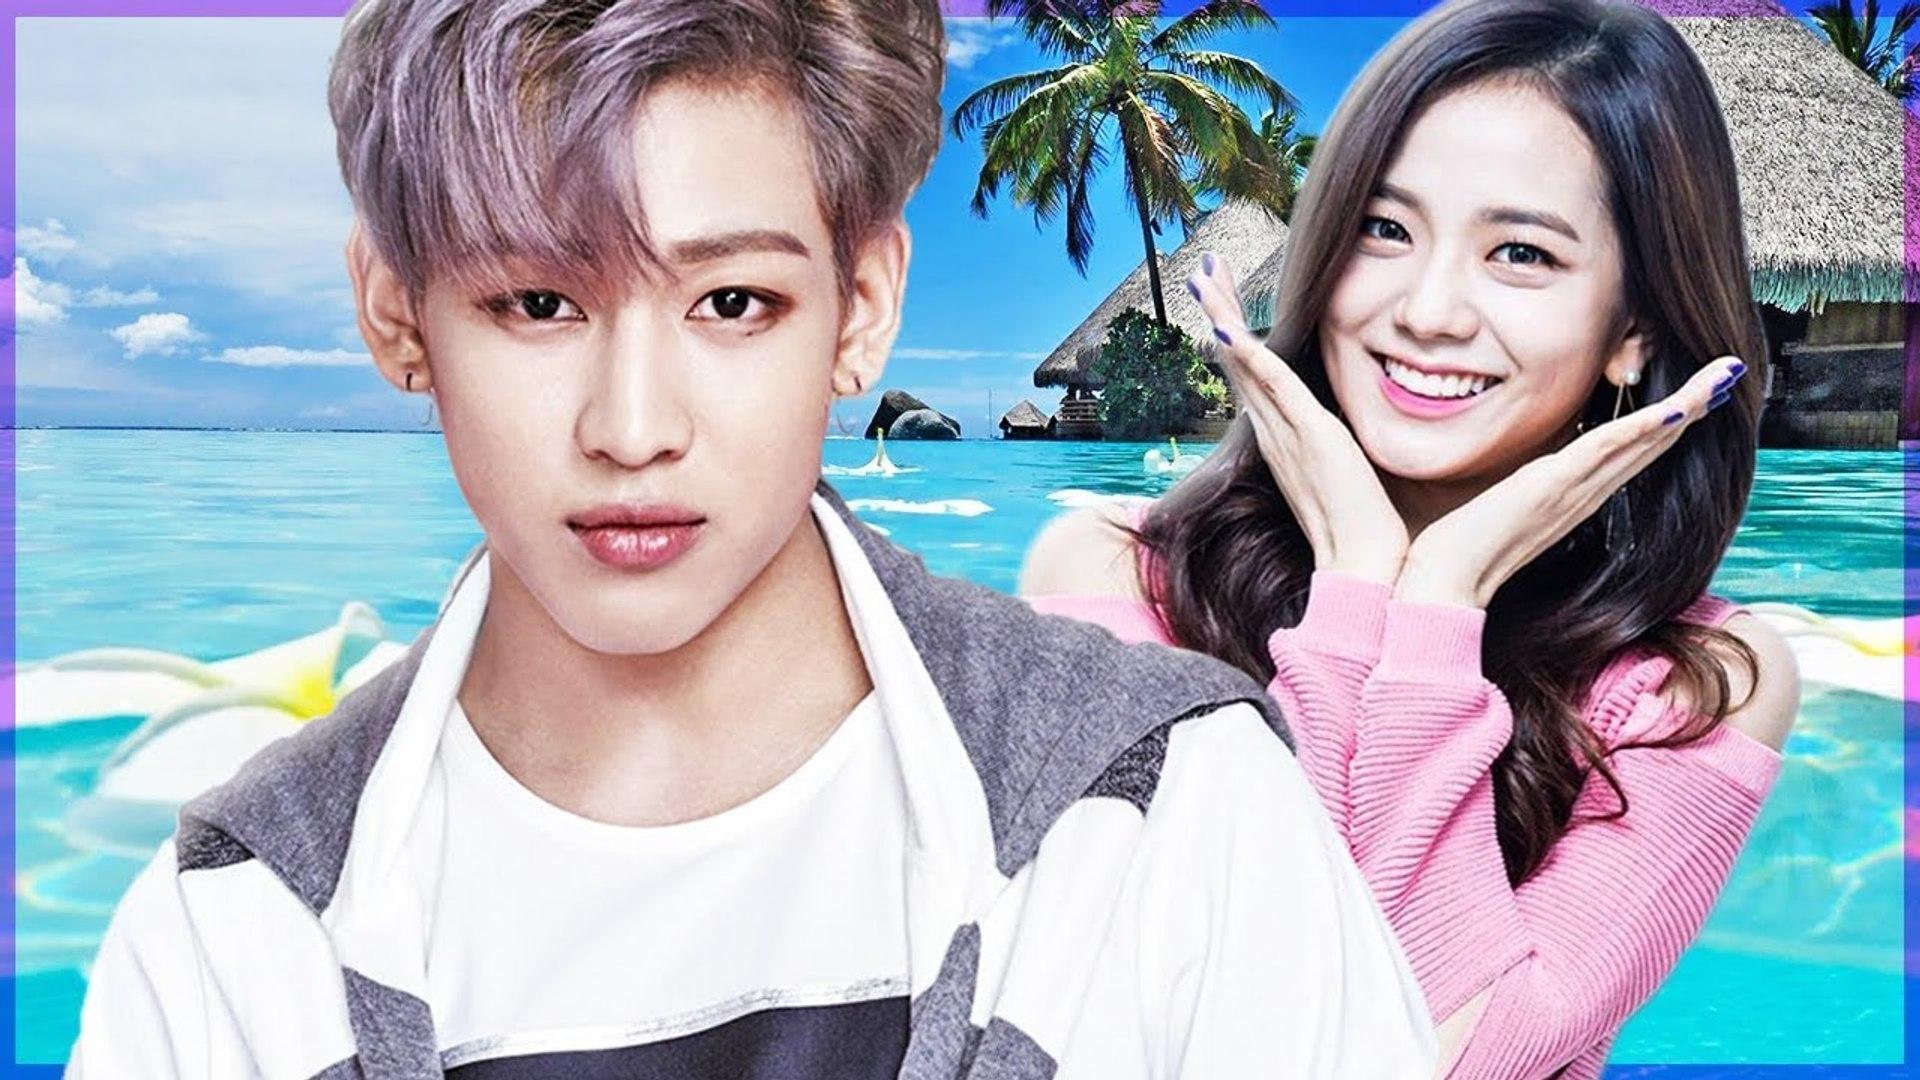 FUNNY K-POP IDOL SOCIAL MEDIA MONTAGE